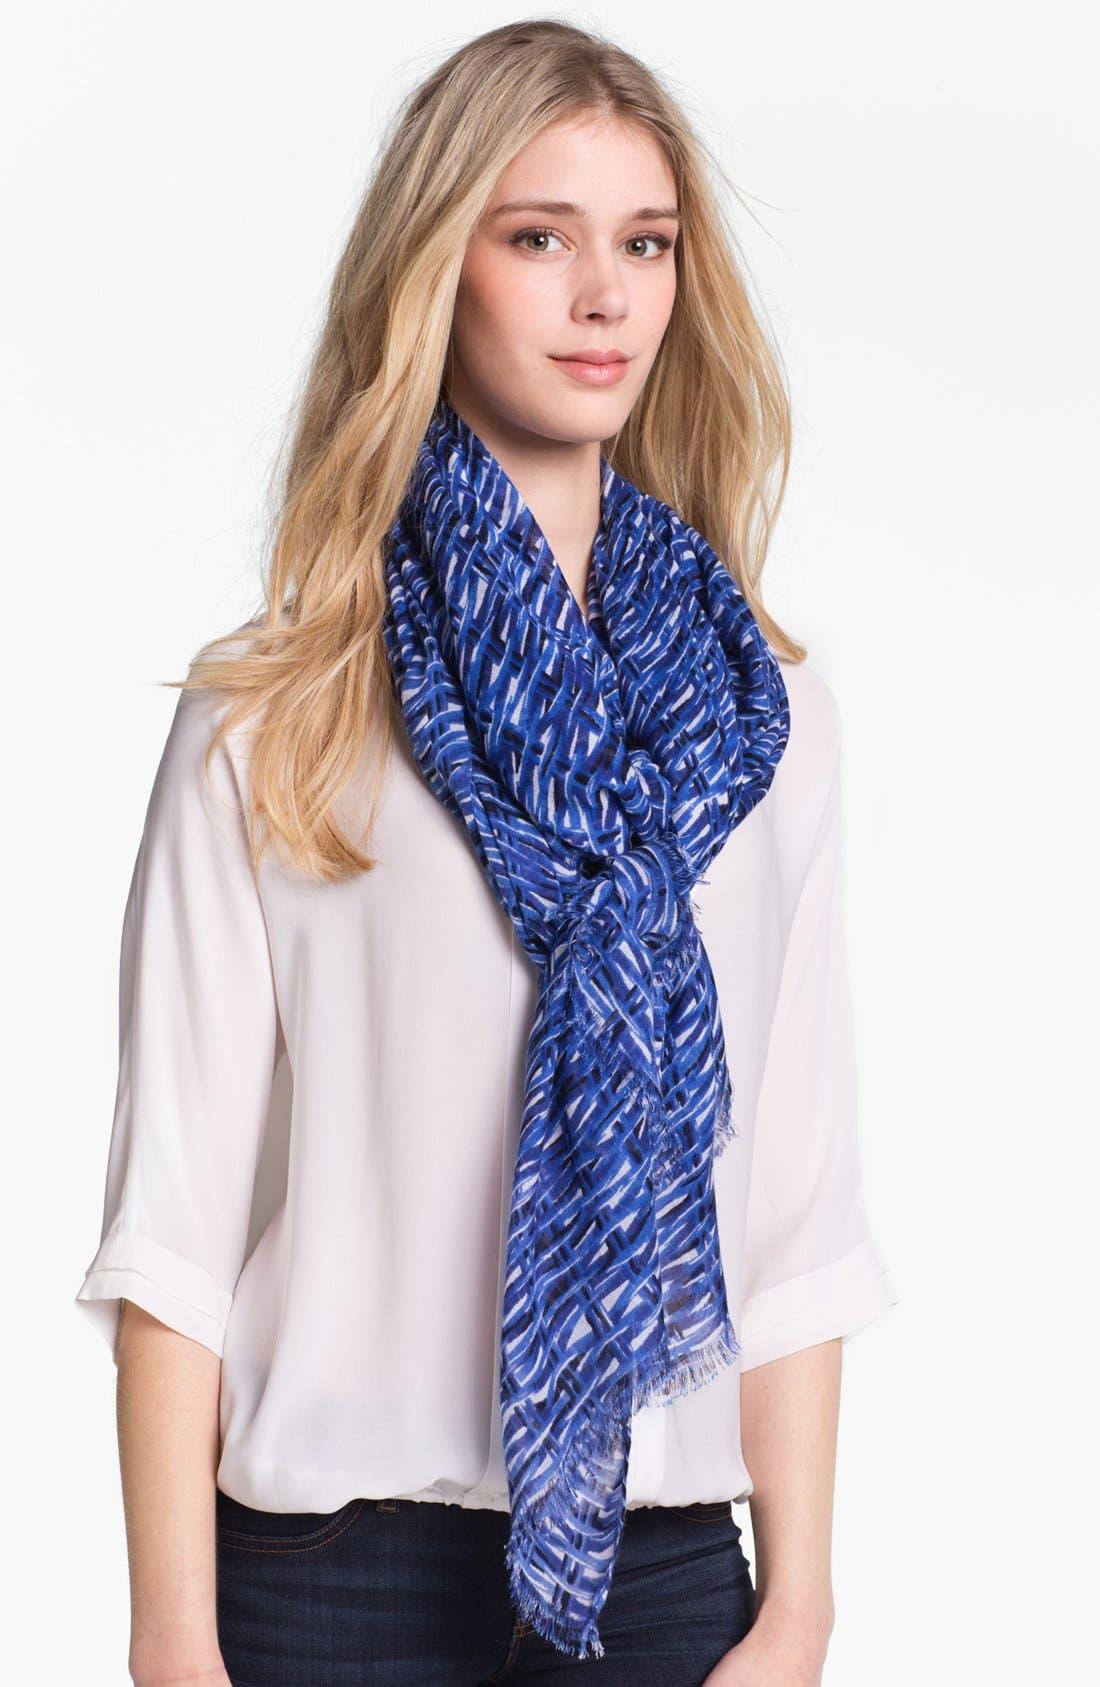 Alternate Image 1 Selected - kate spade new york 'basket weave' scarf